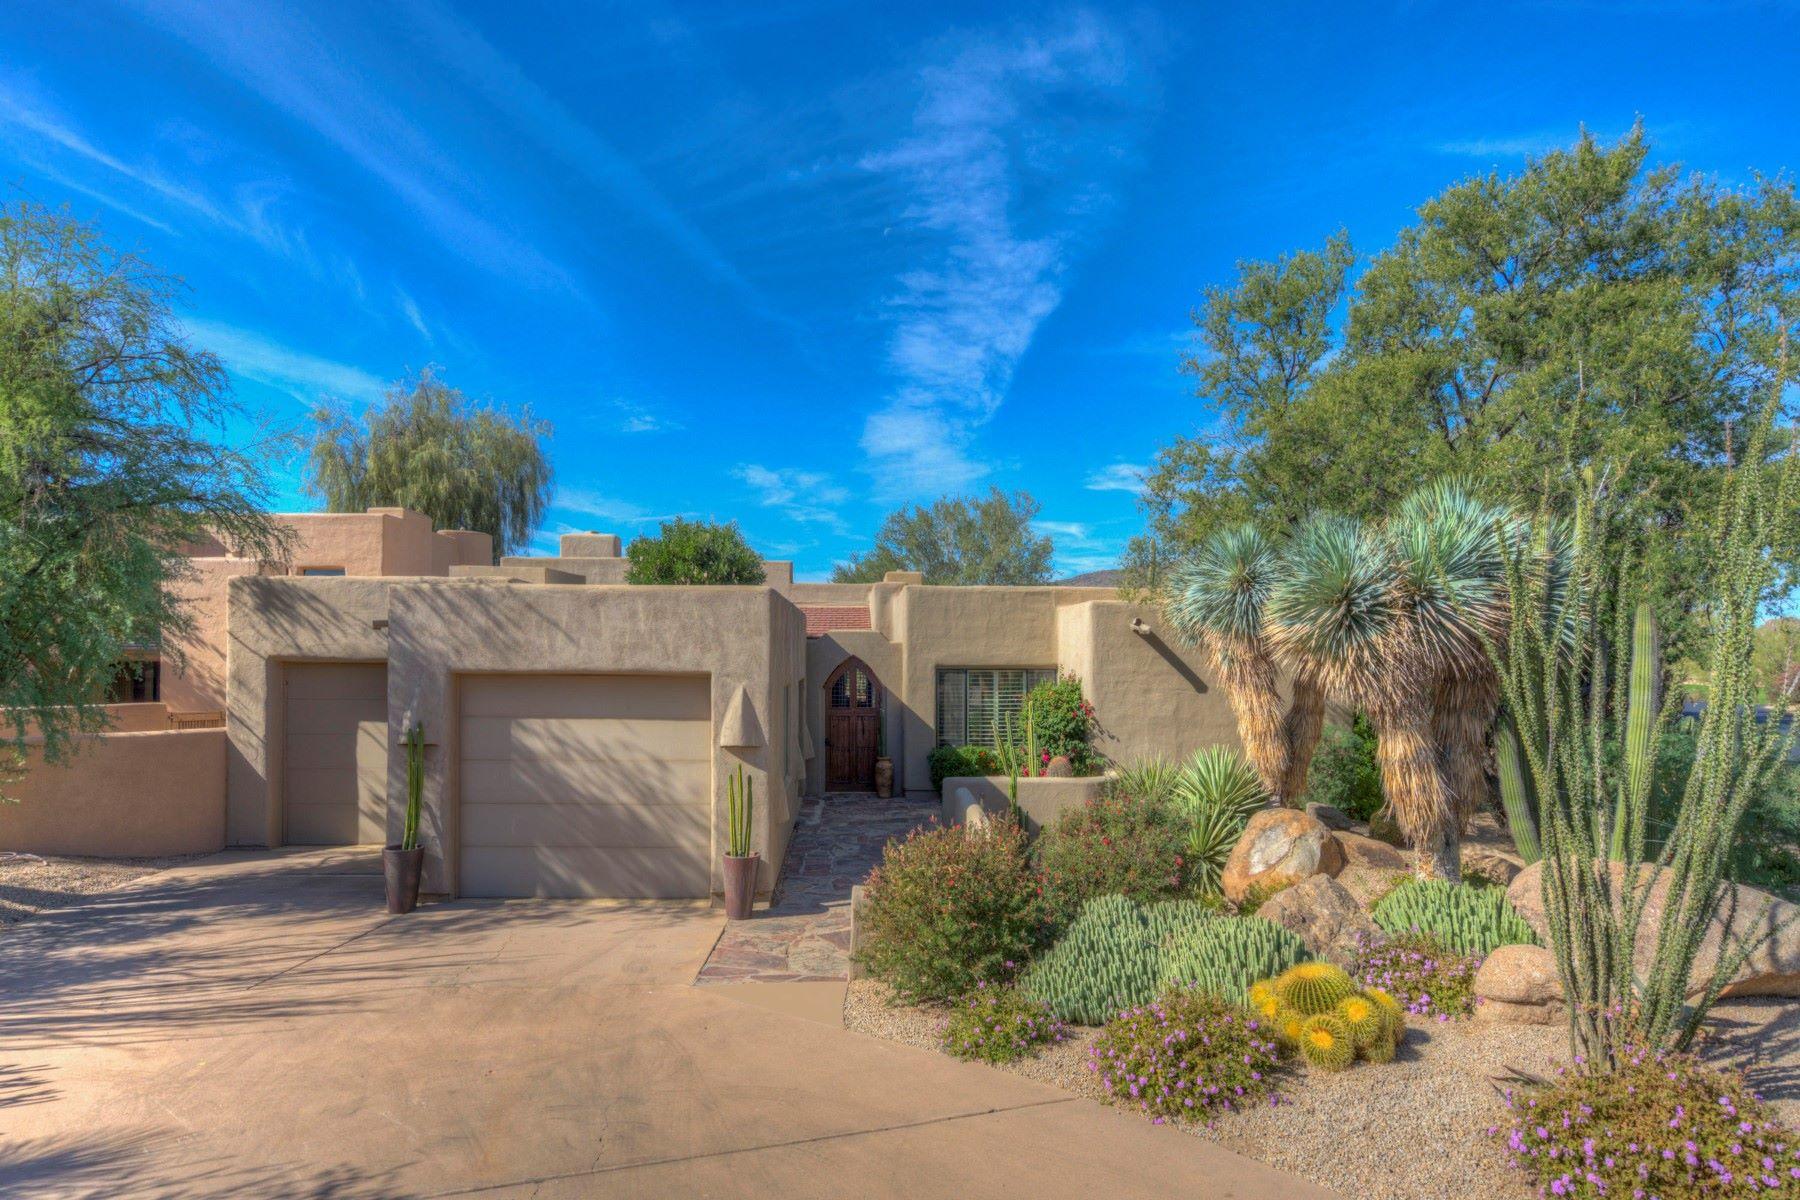 独户住宅 为 销售 在 Charming patio home with sweeping views of the first fairway 1605 N Quartz Valley Rd, 斯科茨代尔, 亚利桑那州, 85266 美国